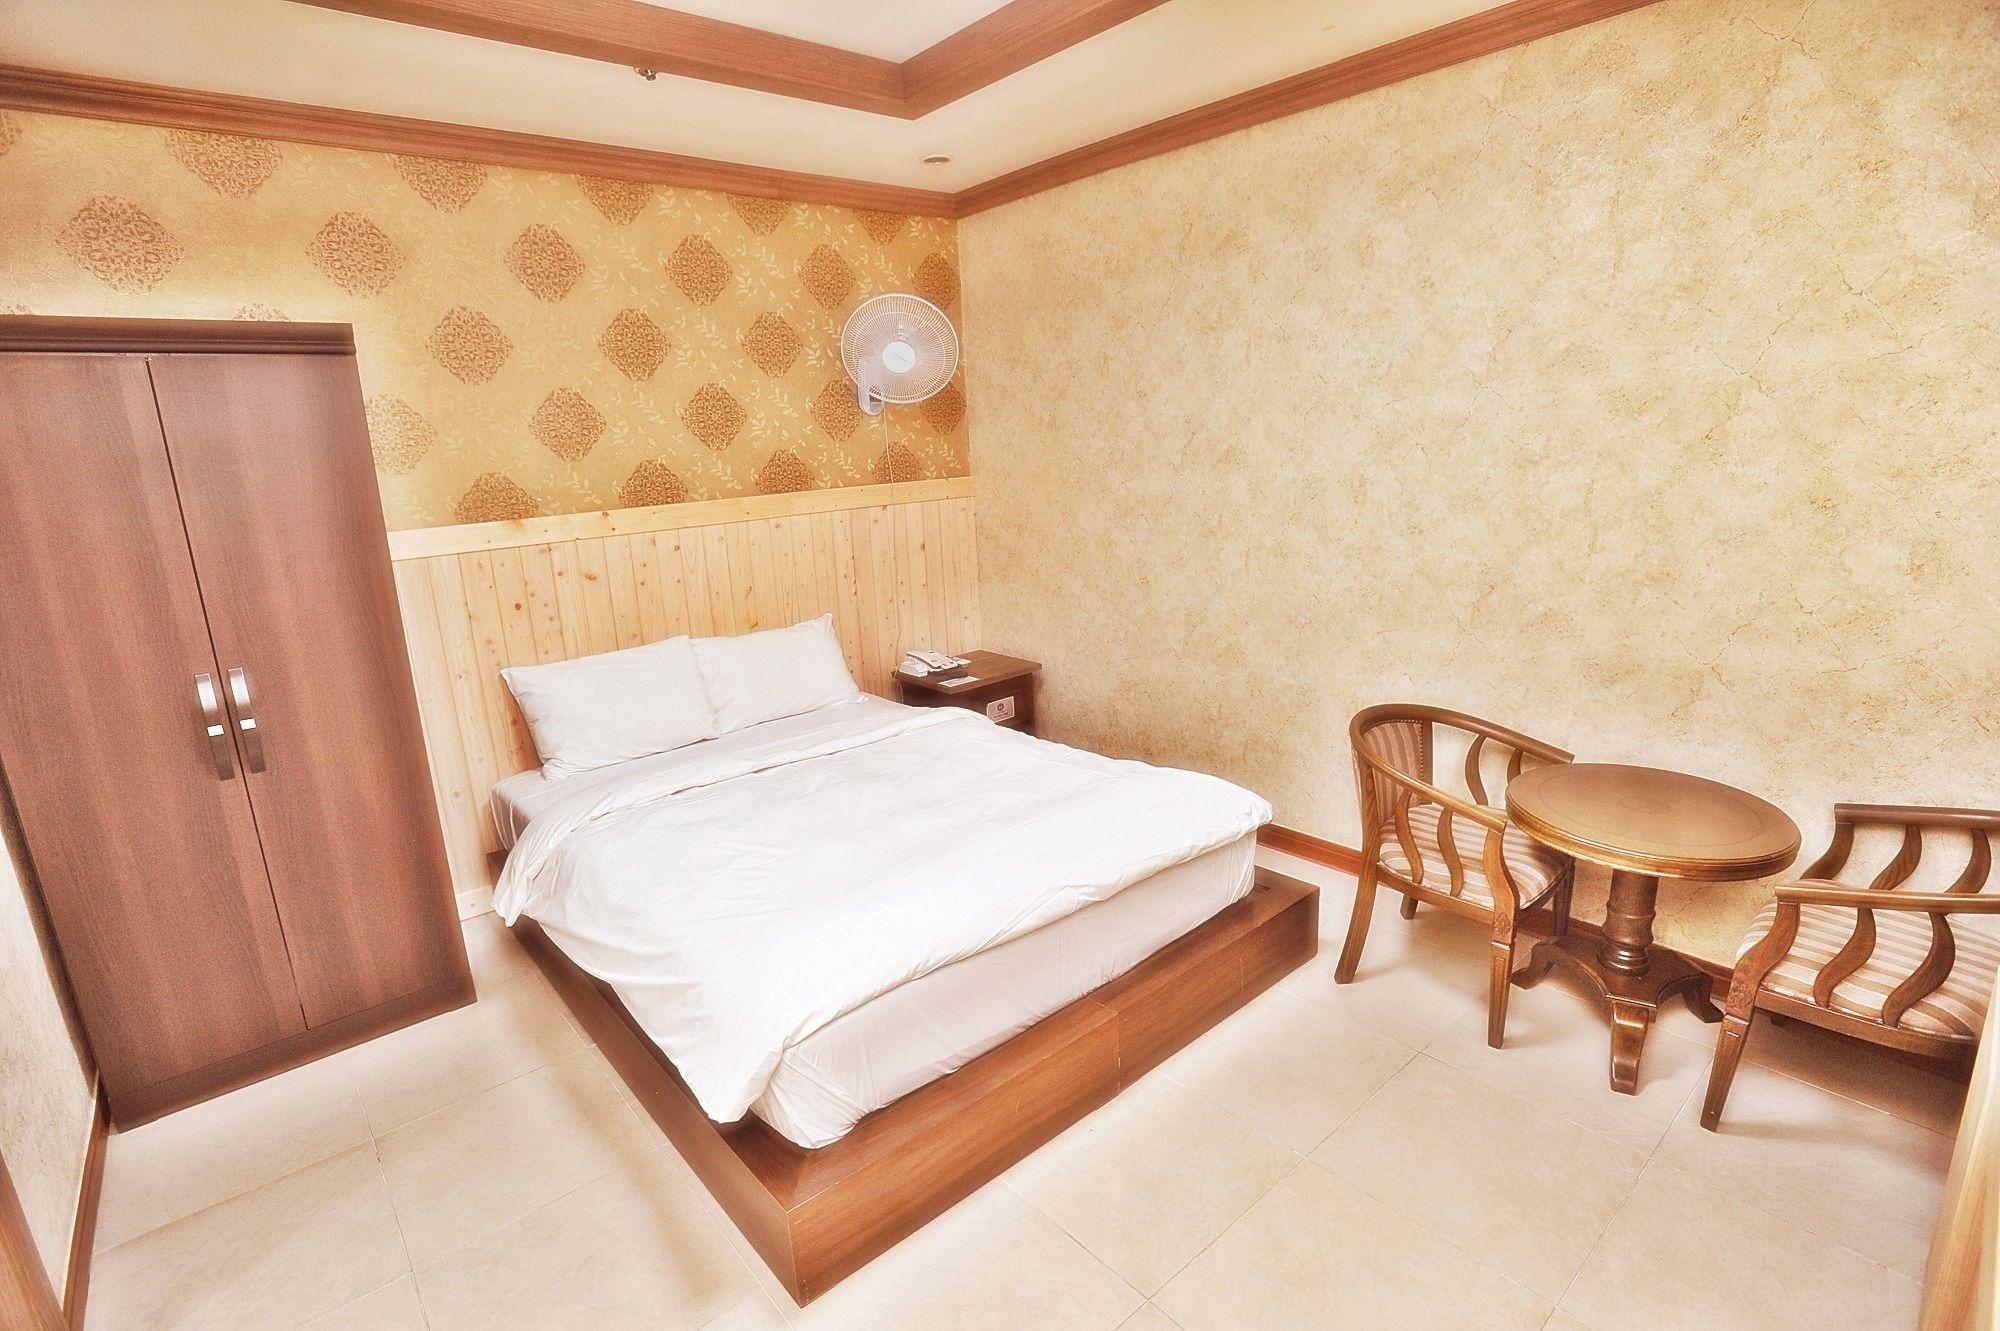 Highfere Hotel, Changwon